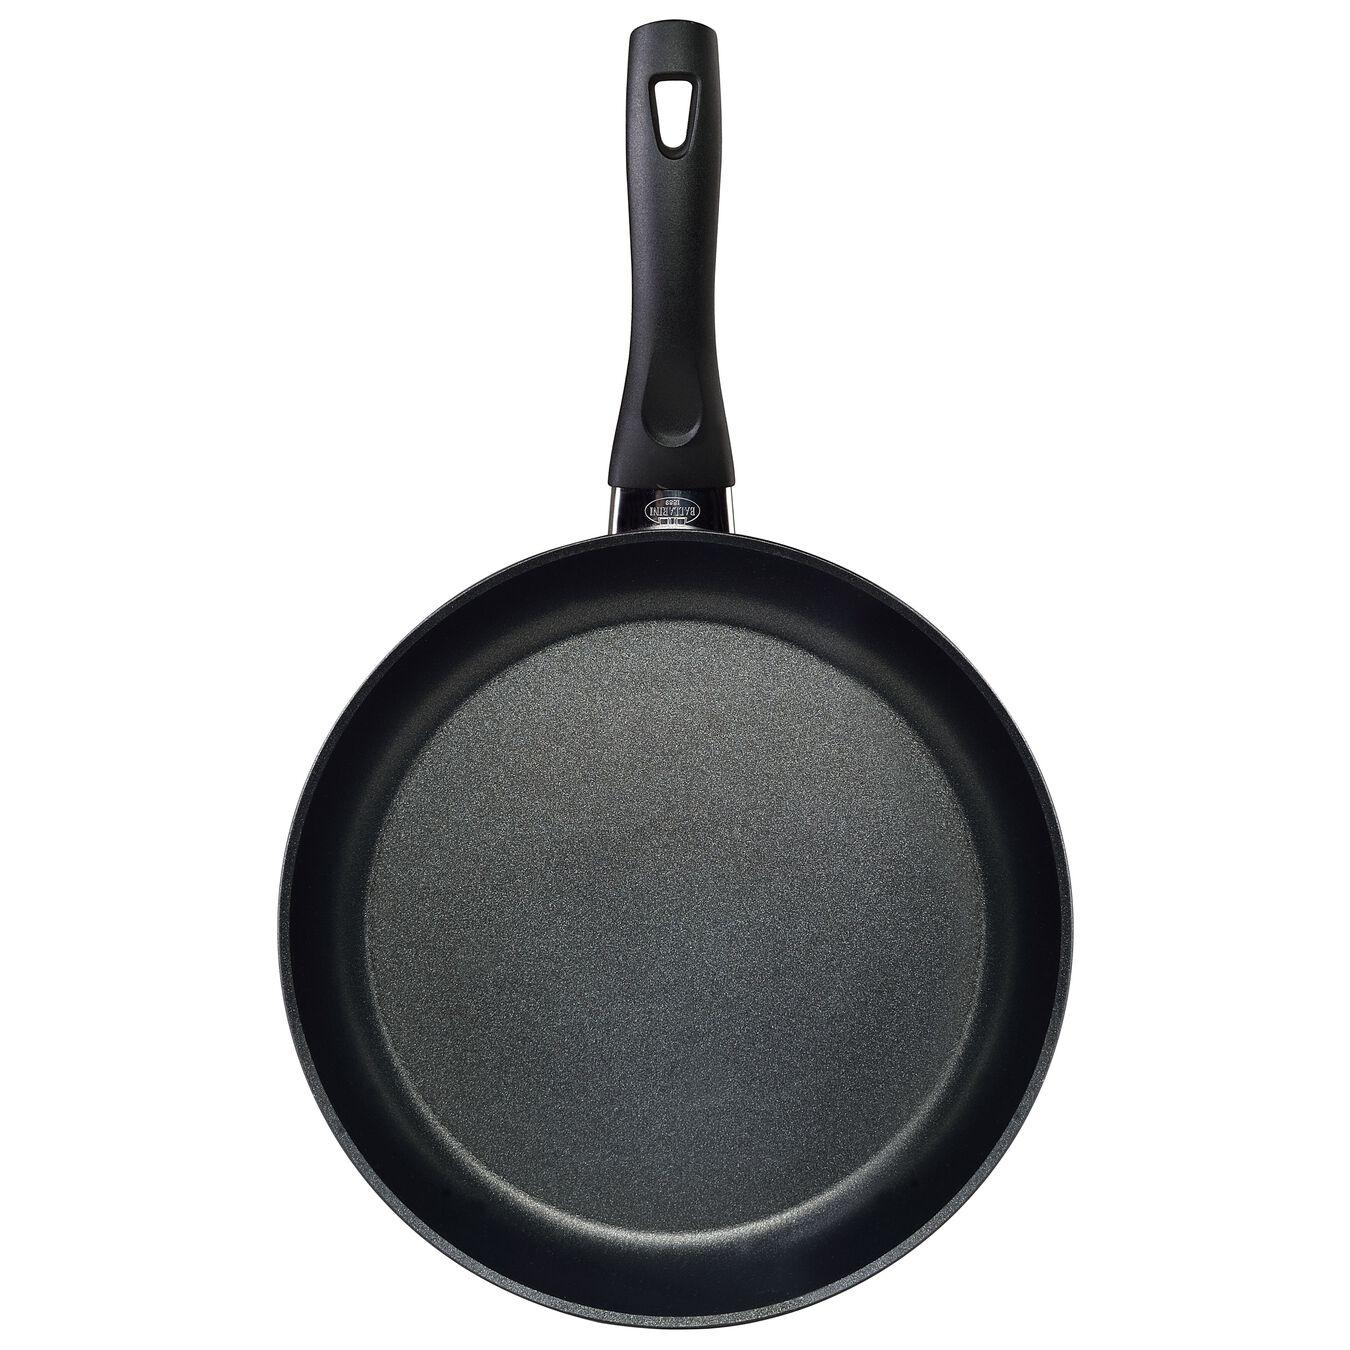 Padella - 28 cm, alluminio, Keravis,,large 3